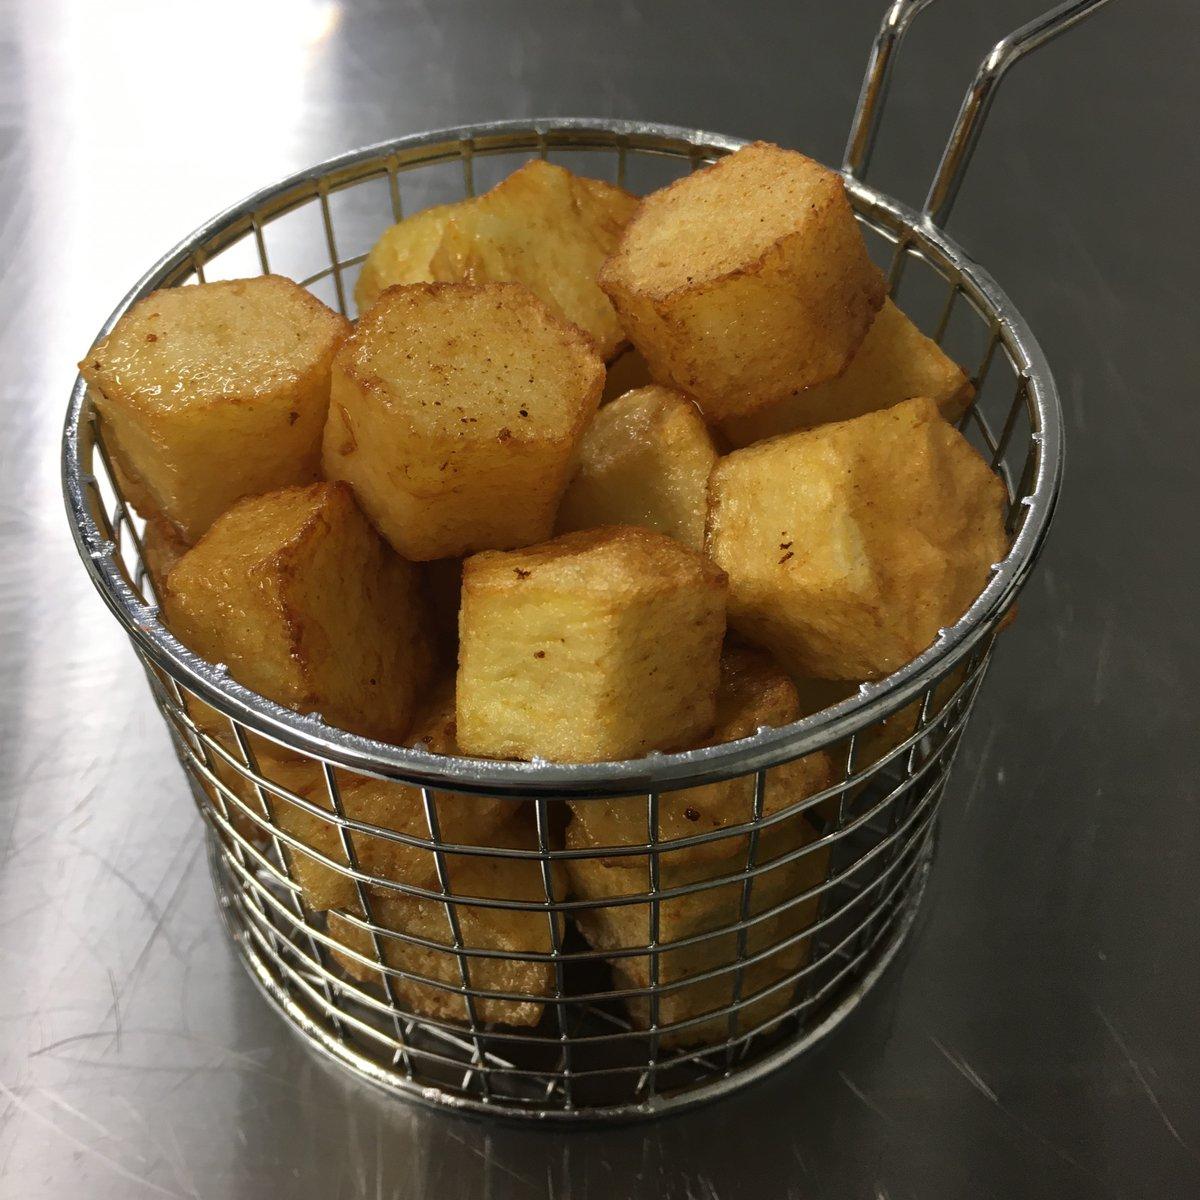 Side of double cooked hexagon potatos in duck fat  #HexagonSwansea #swansea #restaurant #duckfatpotatos #potatoes #swanseafood #welshbusiness #wales #southwales #food #foodphotography #foodie #foodporn #instafood #independentbusiness #familybusiness #doublecookedchipspic.twitter.com/4nKU0QVmBl